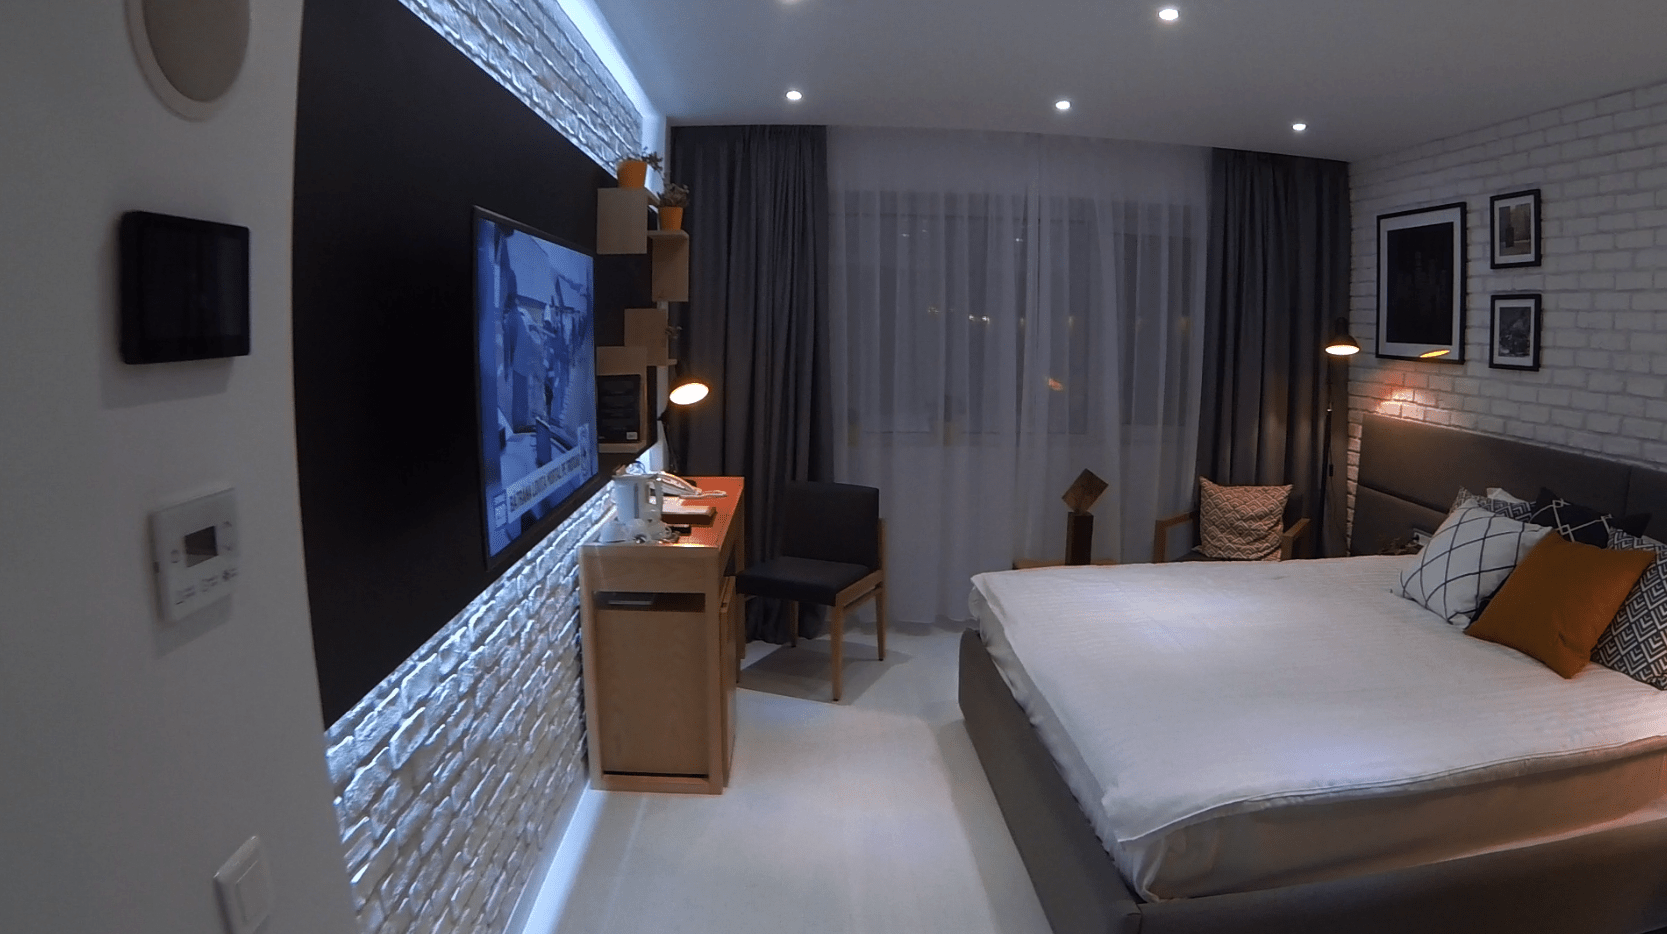 Camera hotel bucuresti design interior stil loft for Camere hotel design